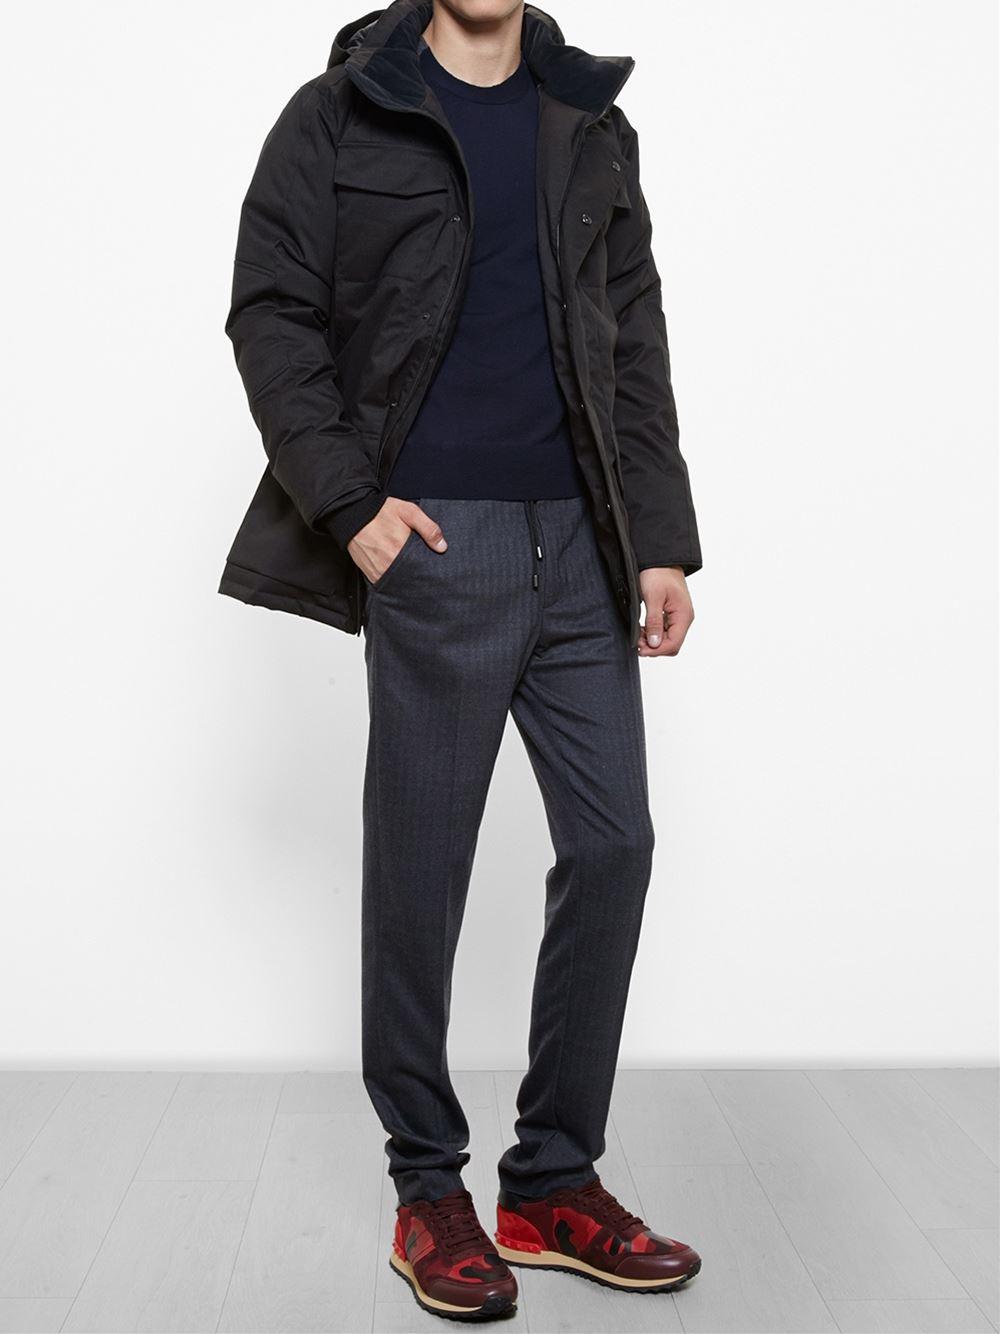 Canada Goose victoria parka sale fake - Canada goose 'branta Windermere' Coat in Black for Men | Lyst